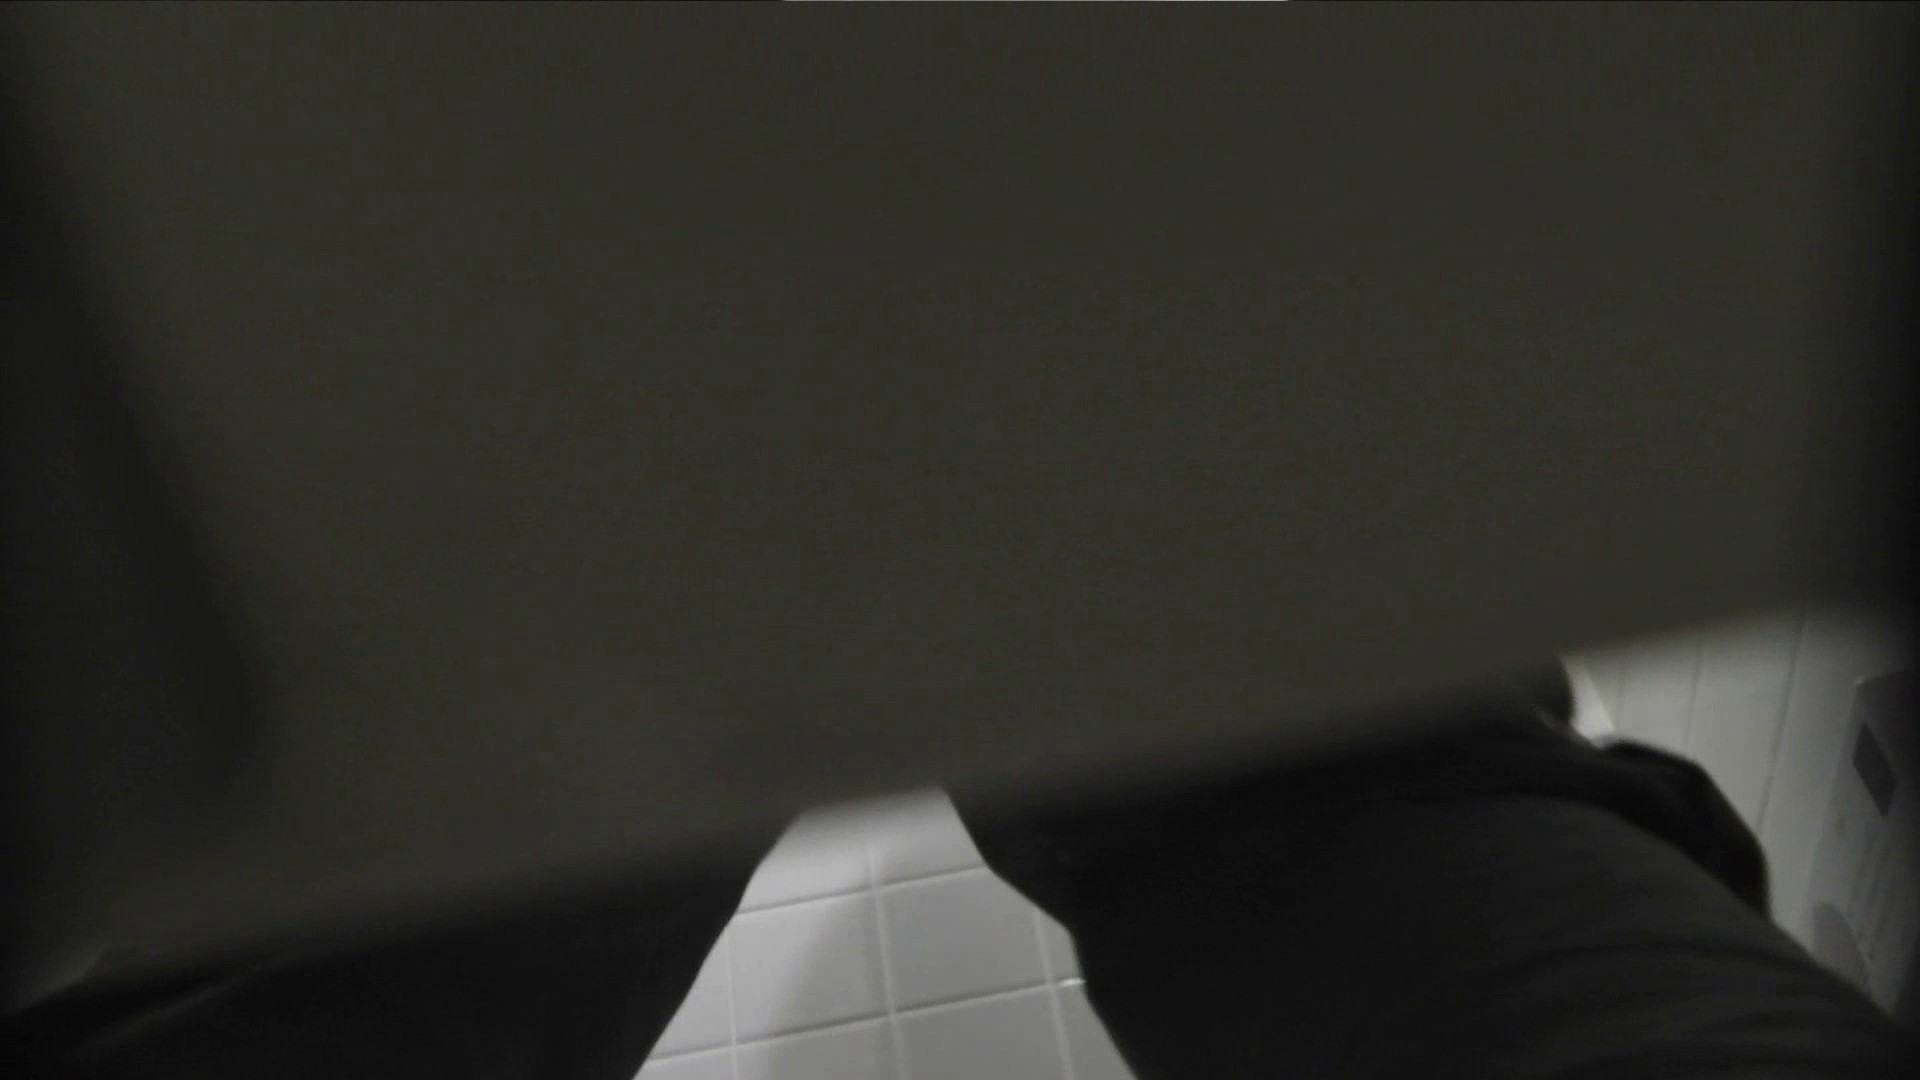 vol.96 命がけ潜伏洗面所! あっ!気付かれたか? プライベート映像お届け 濡れ場動画紹介 93連発 74